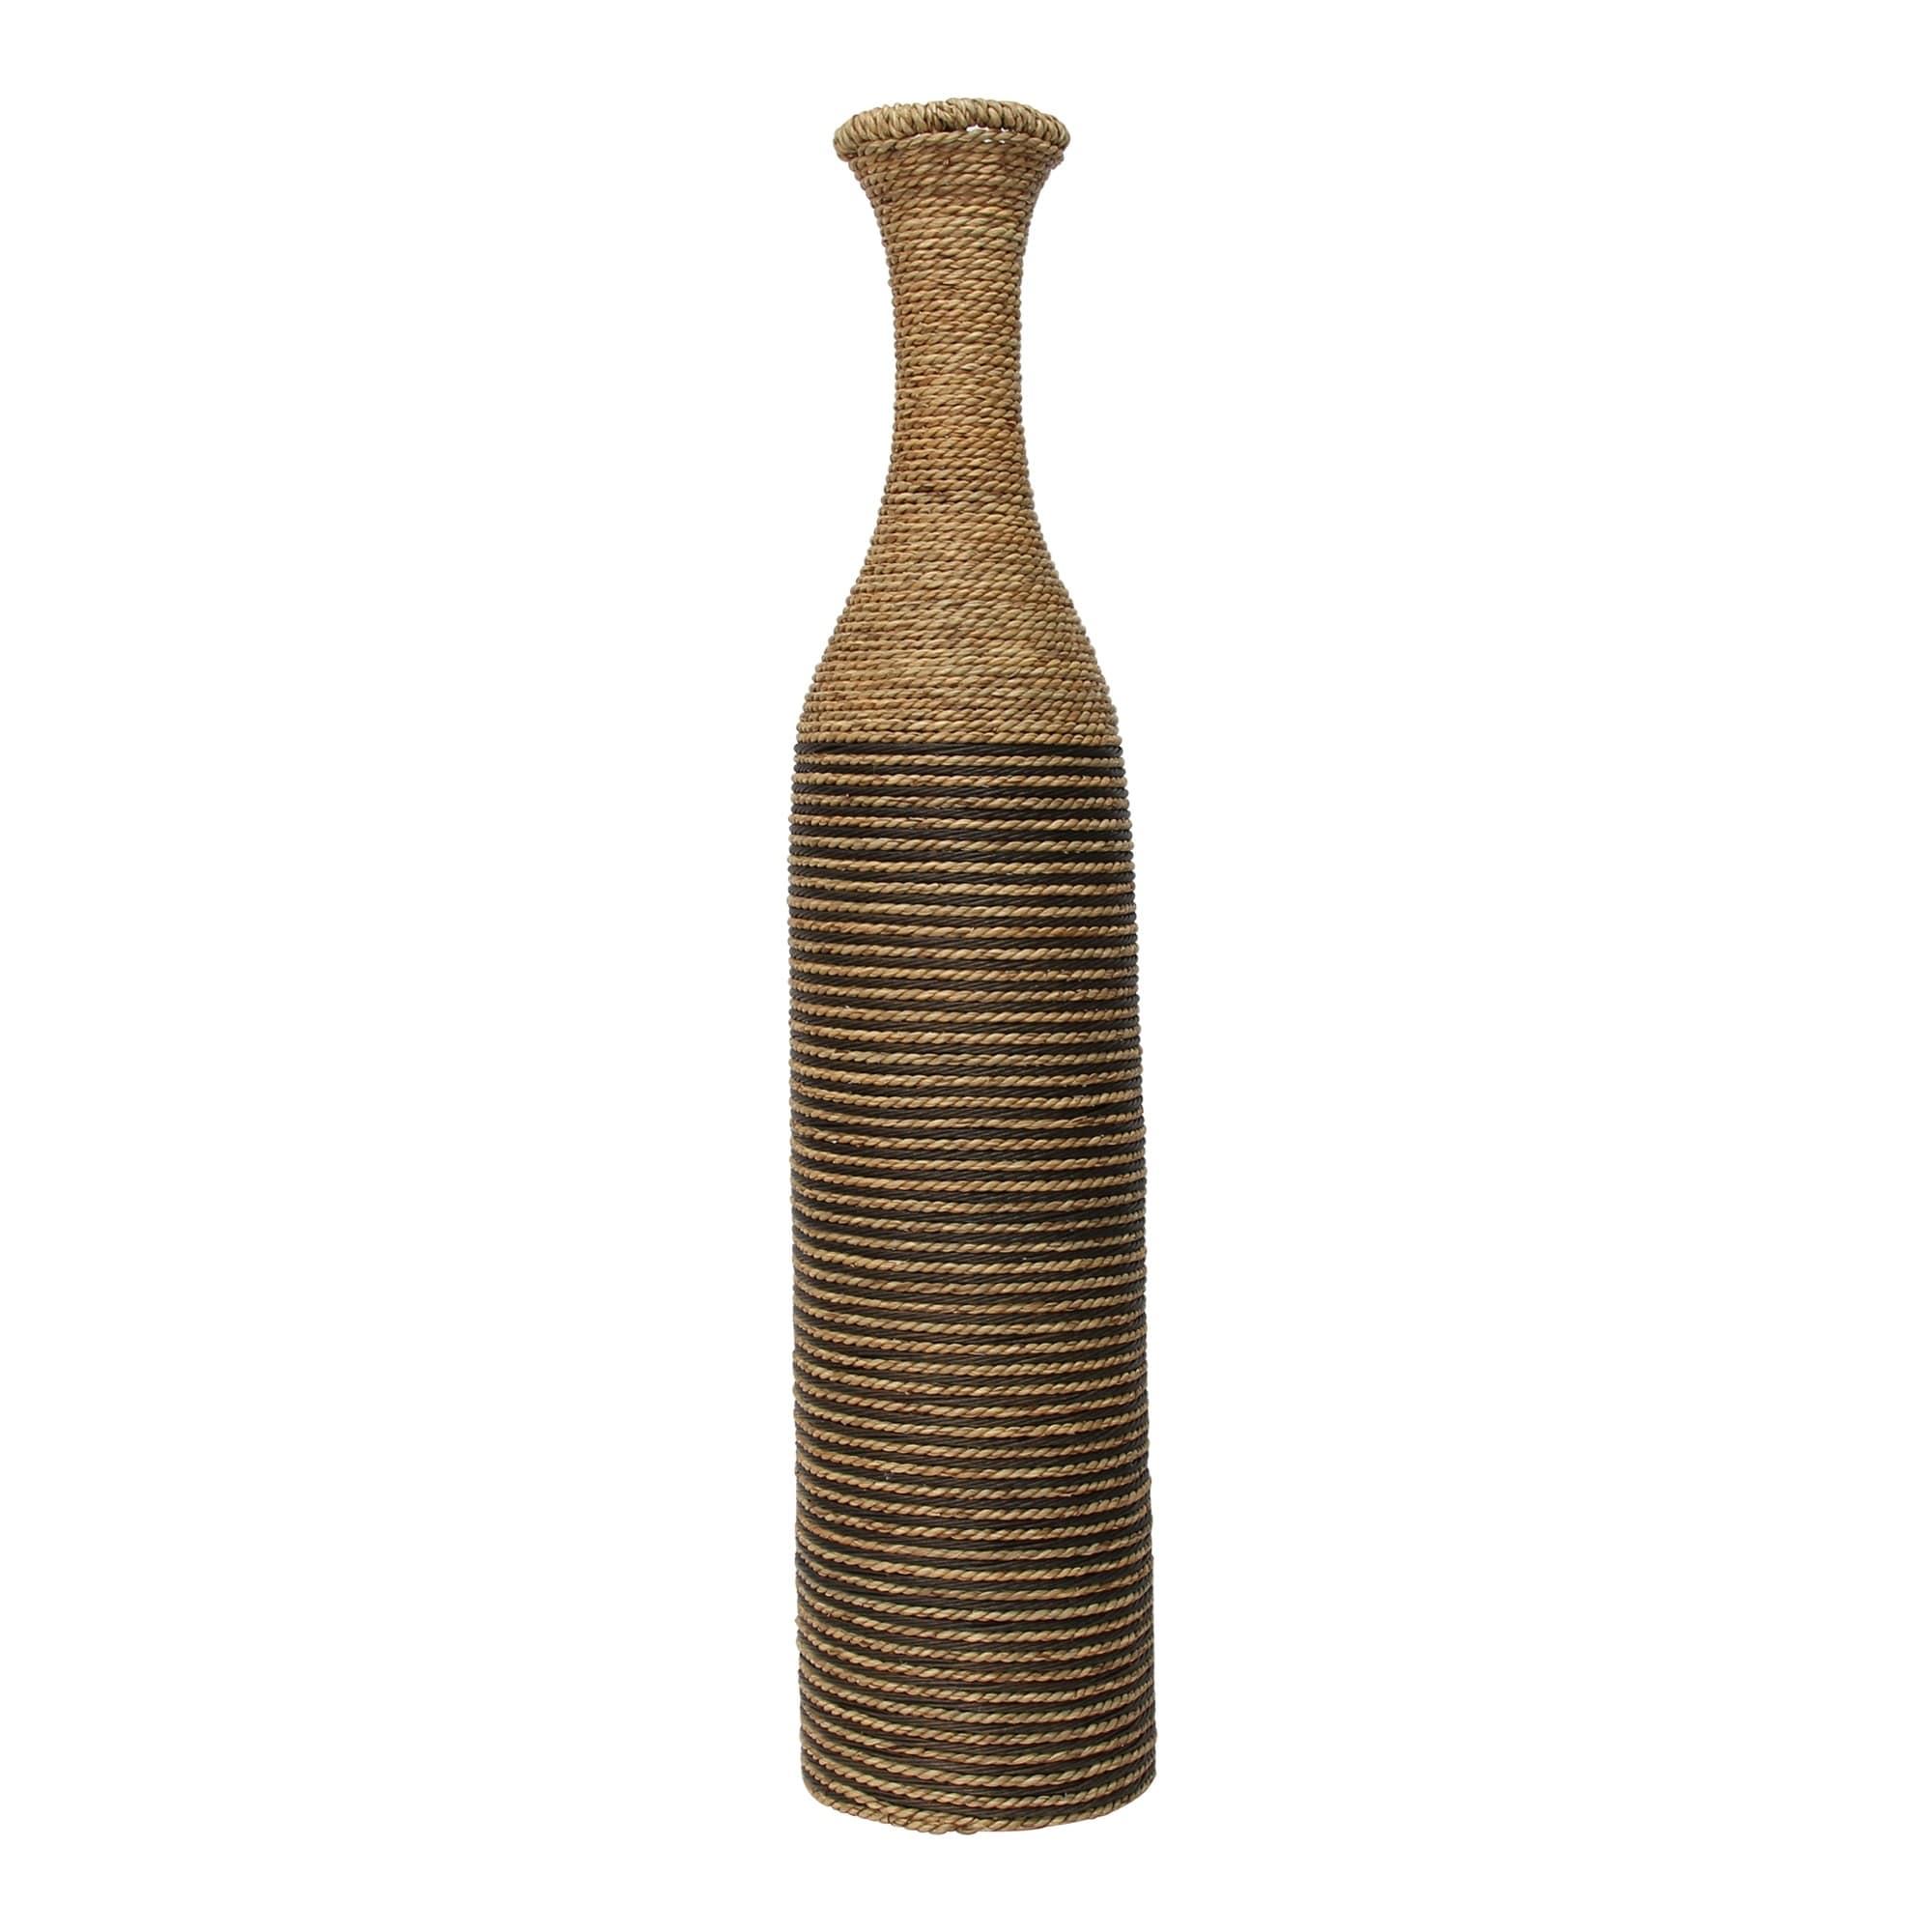 Shop Stratton Home Decor Tall Woven Rattan Floor Vase 7 50 X 7 50 X 36 00 On Sale Overstock 31103675